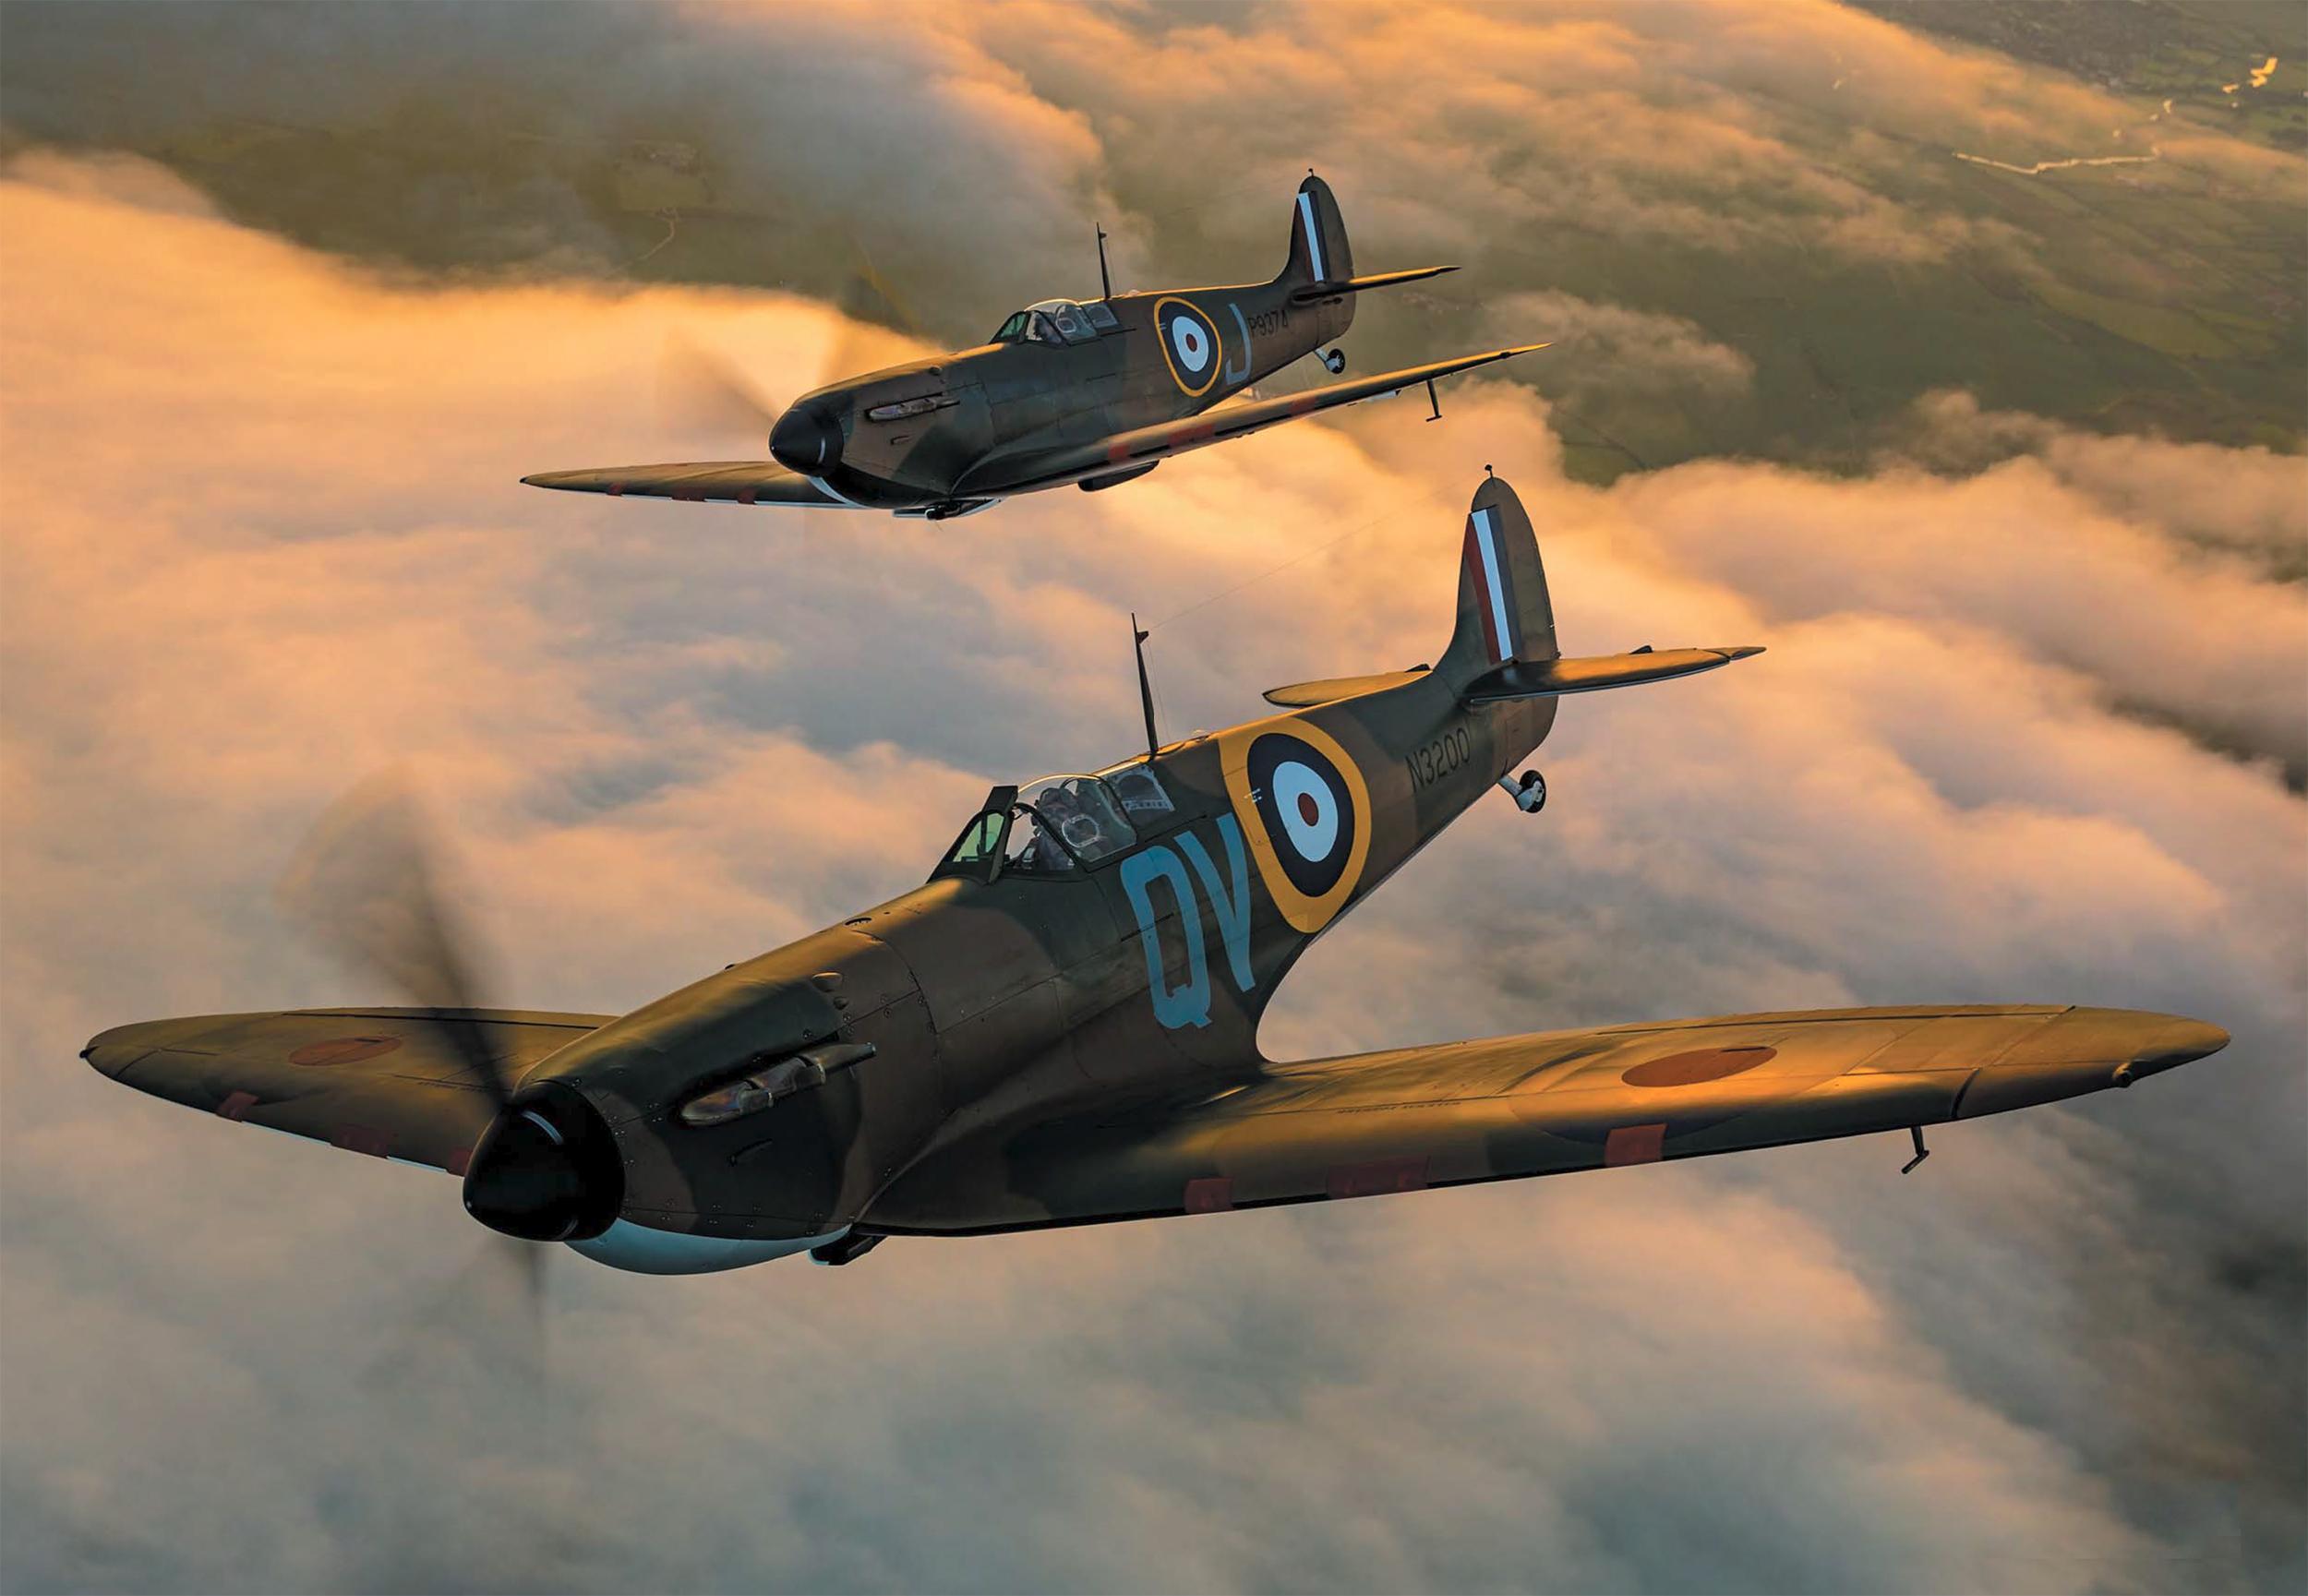 Airworthy Spitfire warbird MkI RAF 19Sqn QV N3200 and P9374 Aeroplane Sept 2015 02